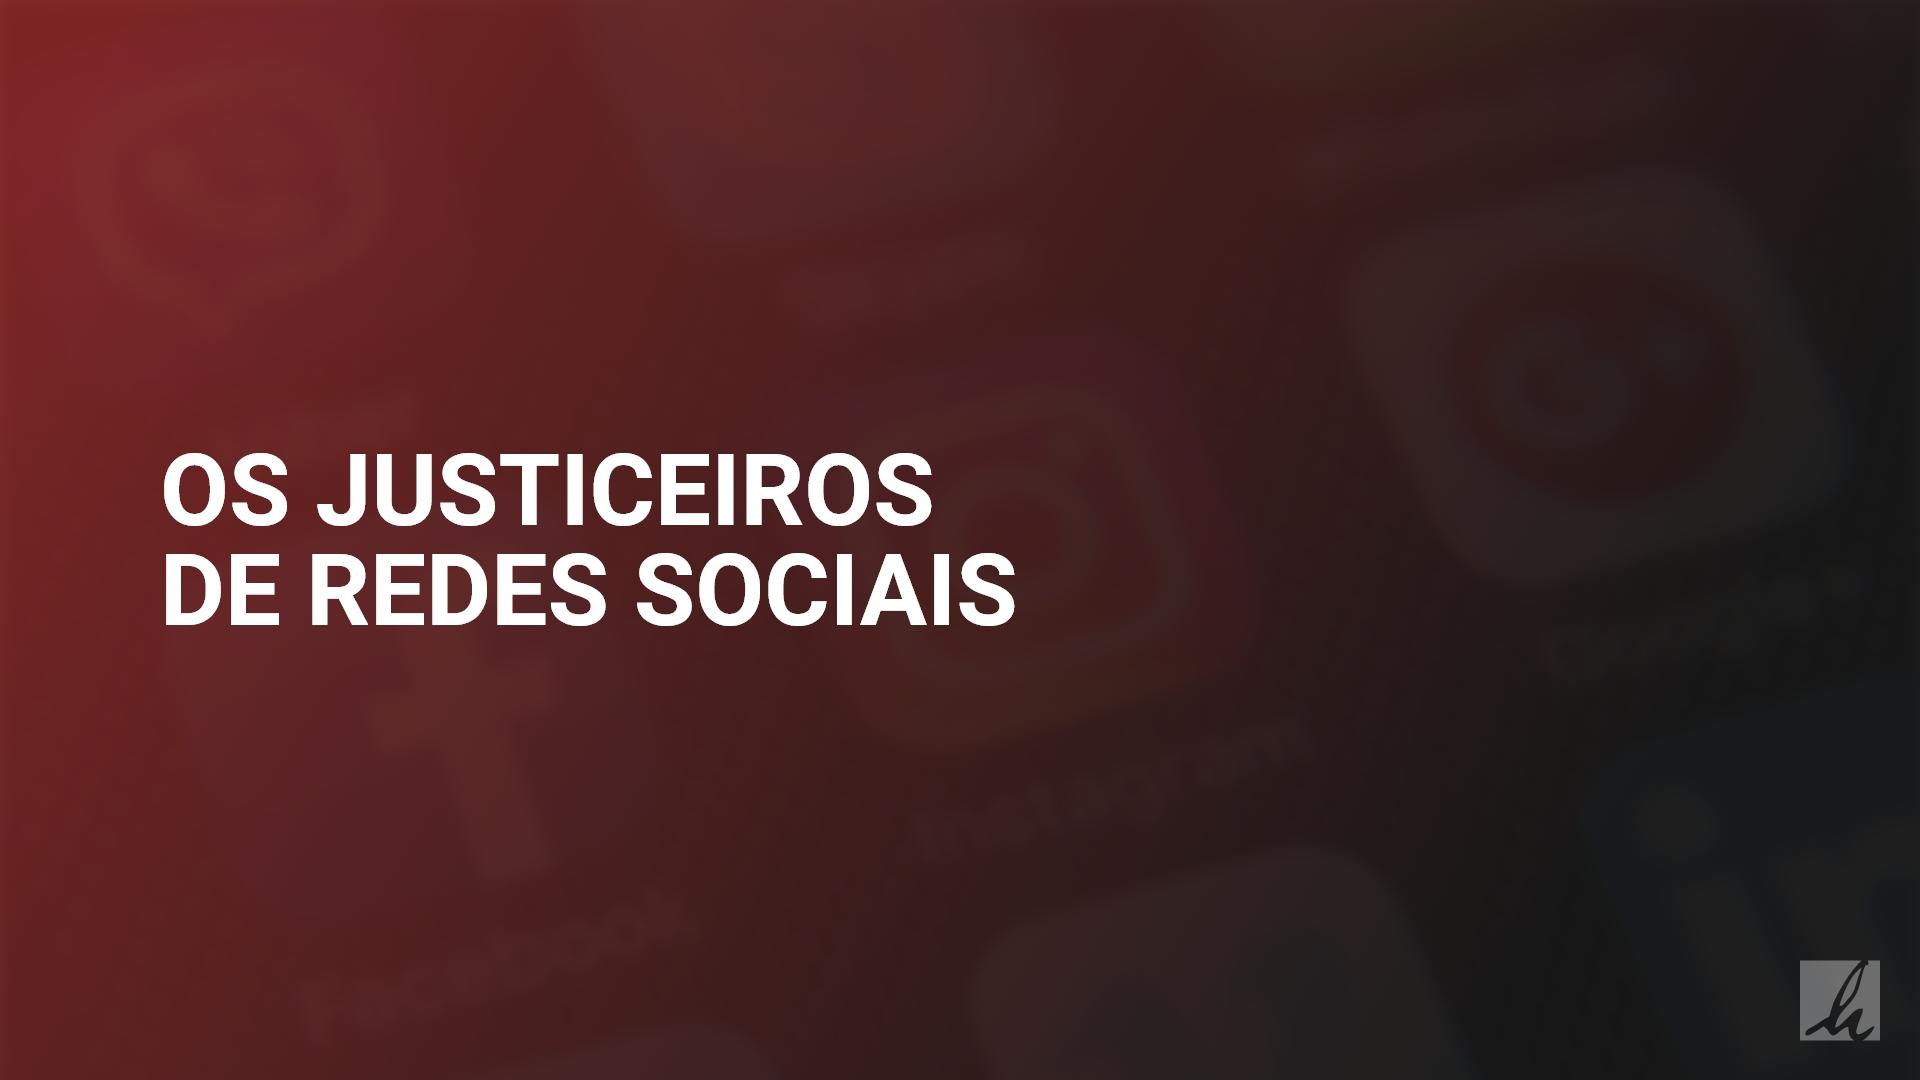 Os justiceiros de redes sociais